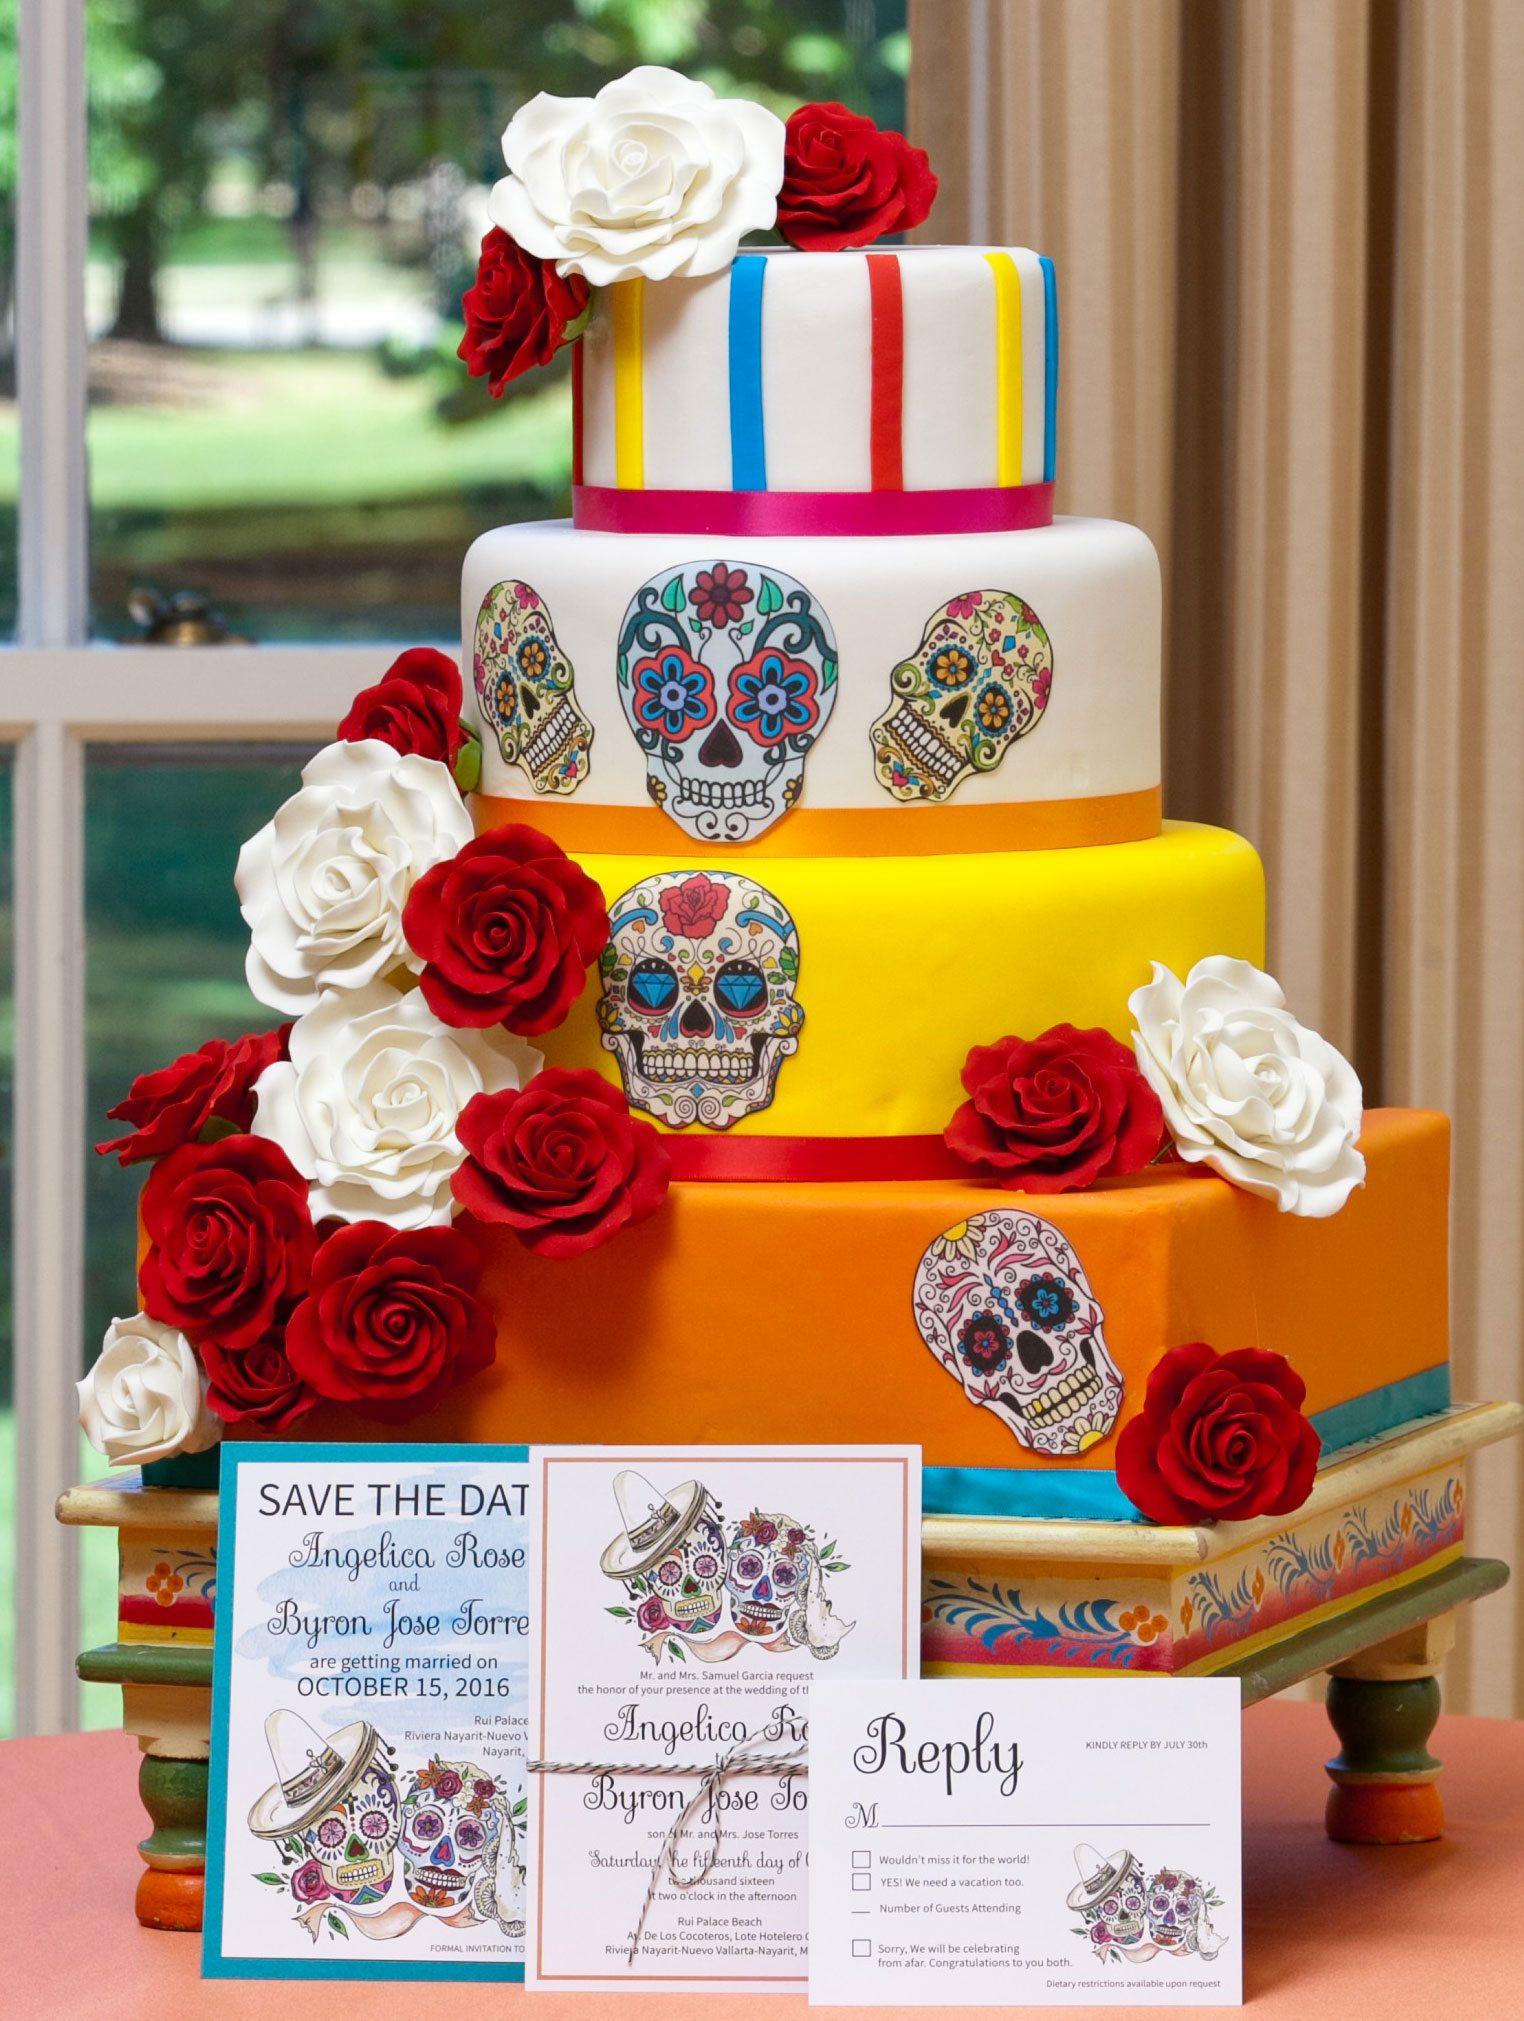 Invitation inspiration from Chicago\'s top invitation designers - The ...